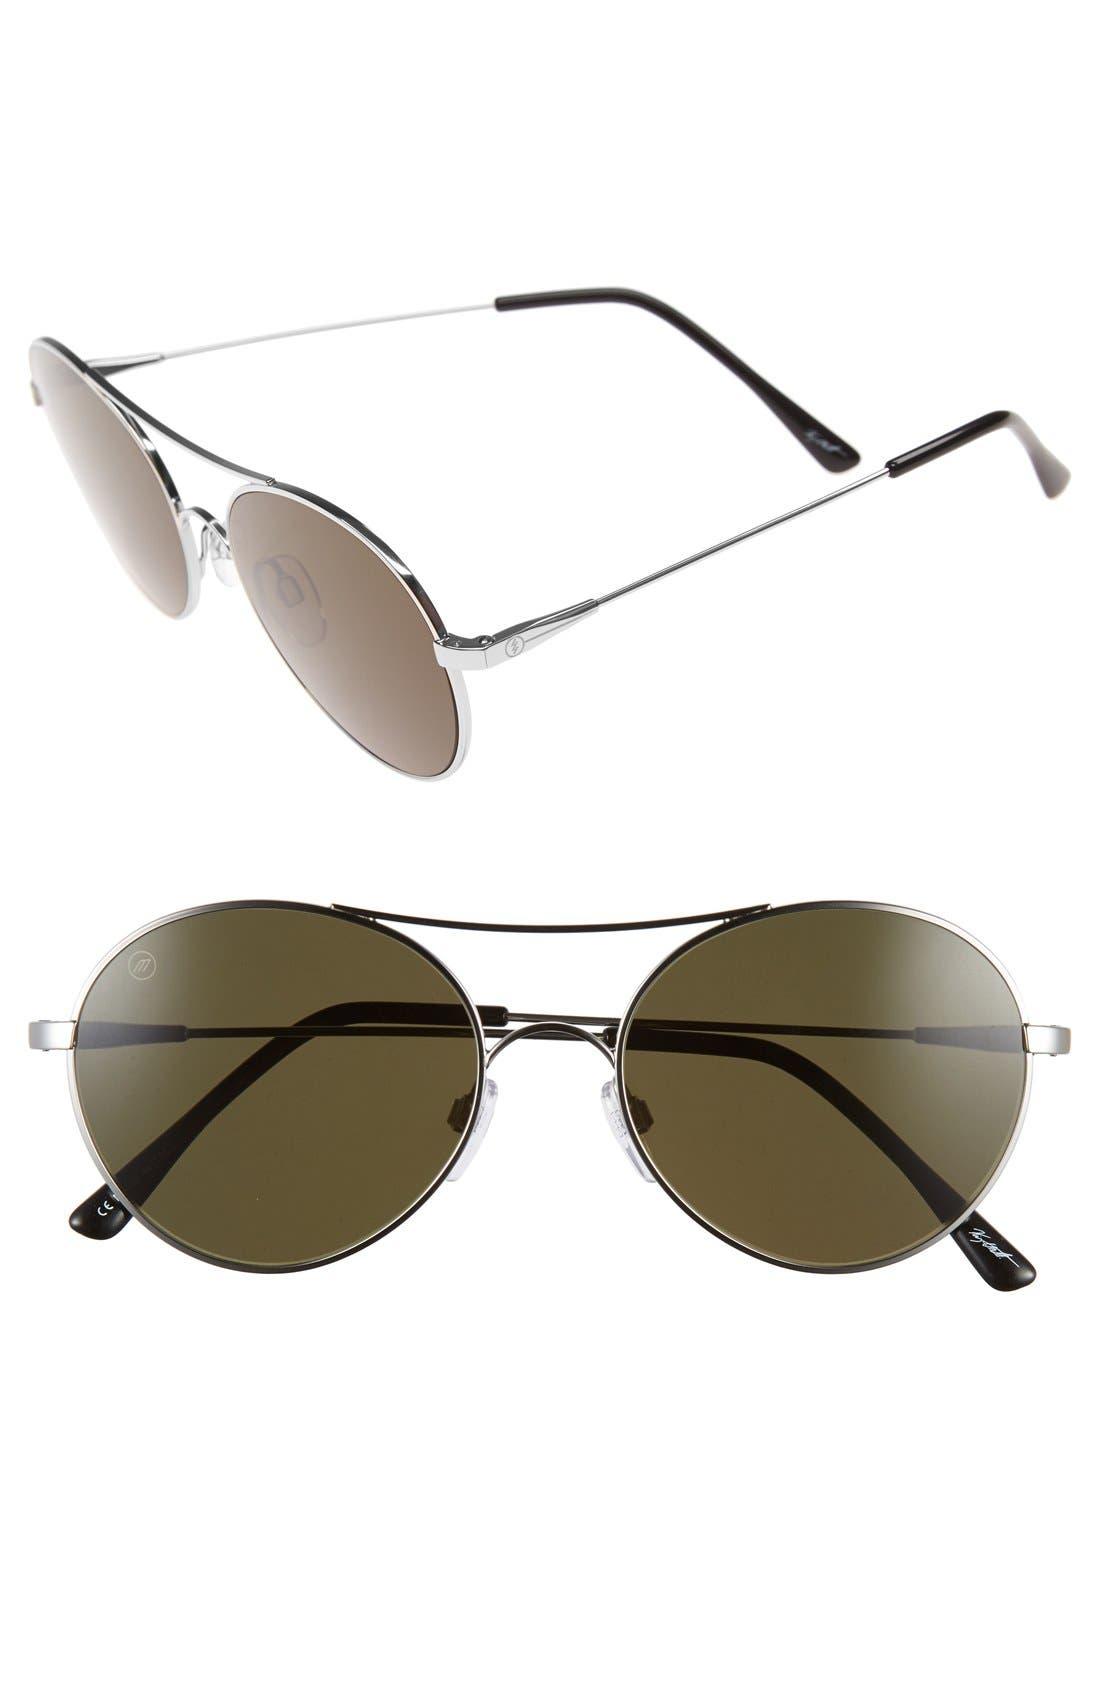 Main Image - ELECTRIC 'Huxley' 53mm Round Sunglasses